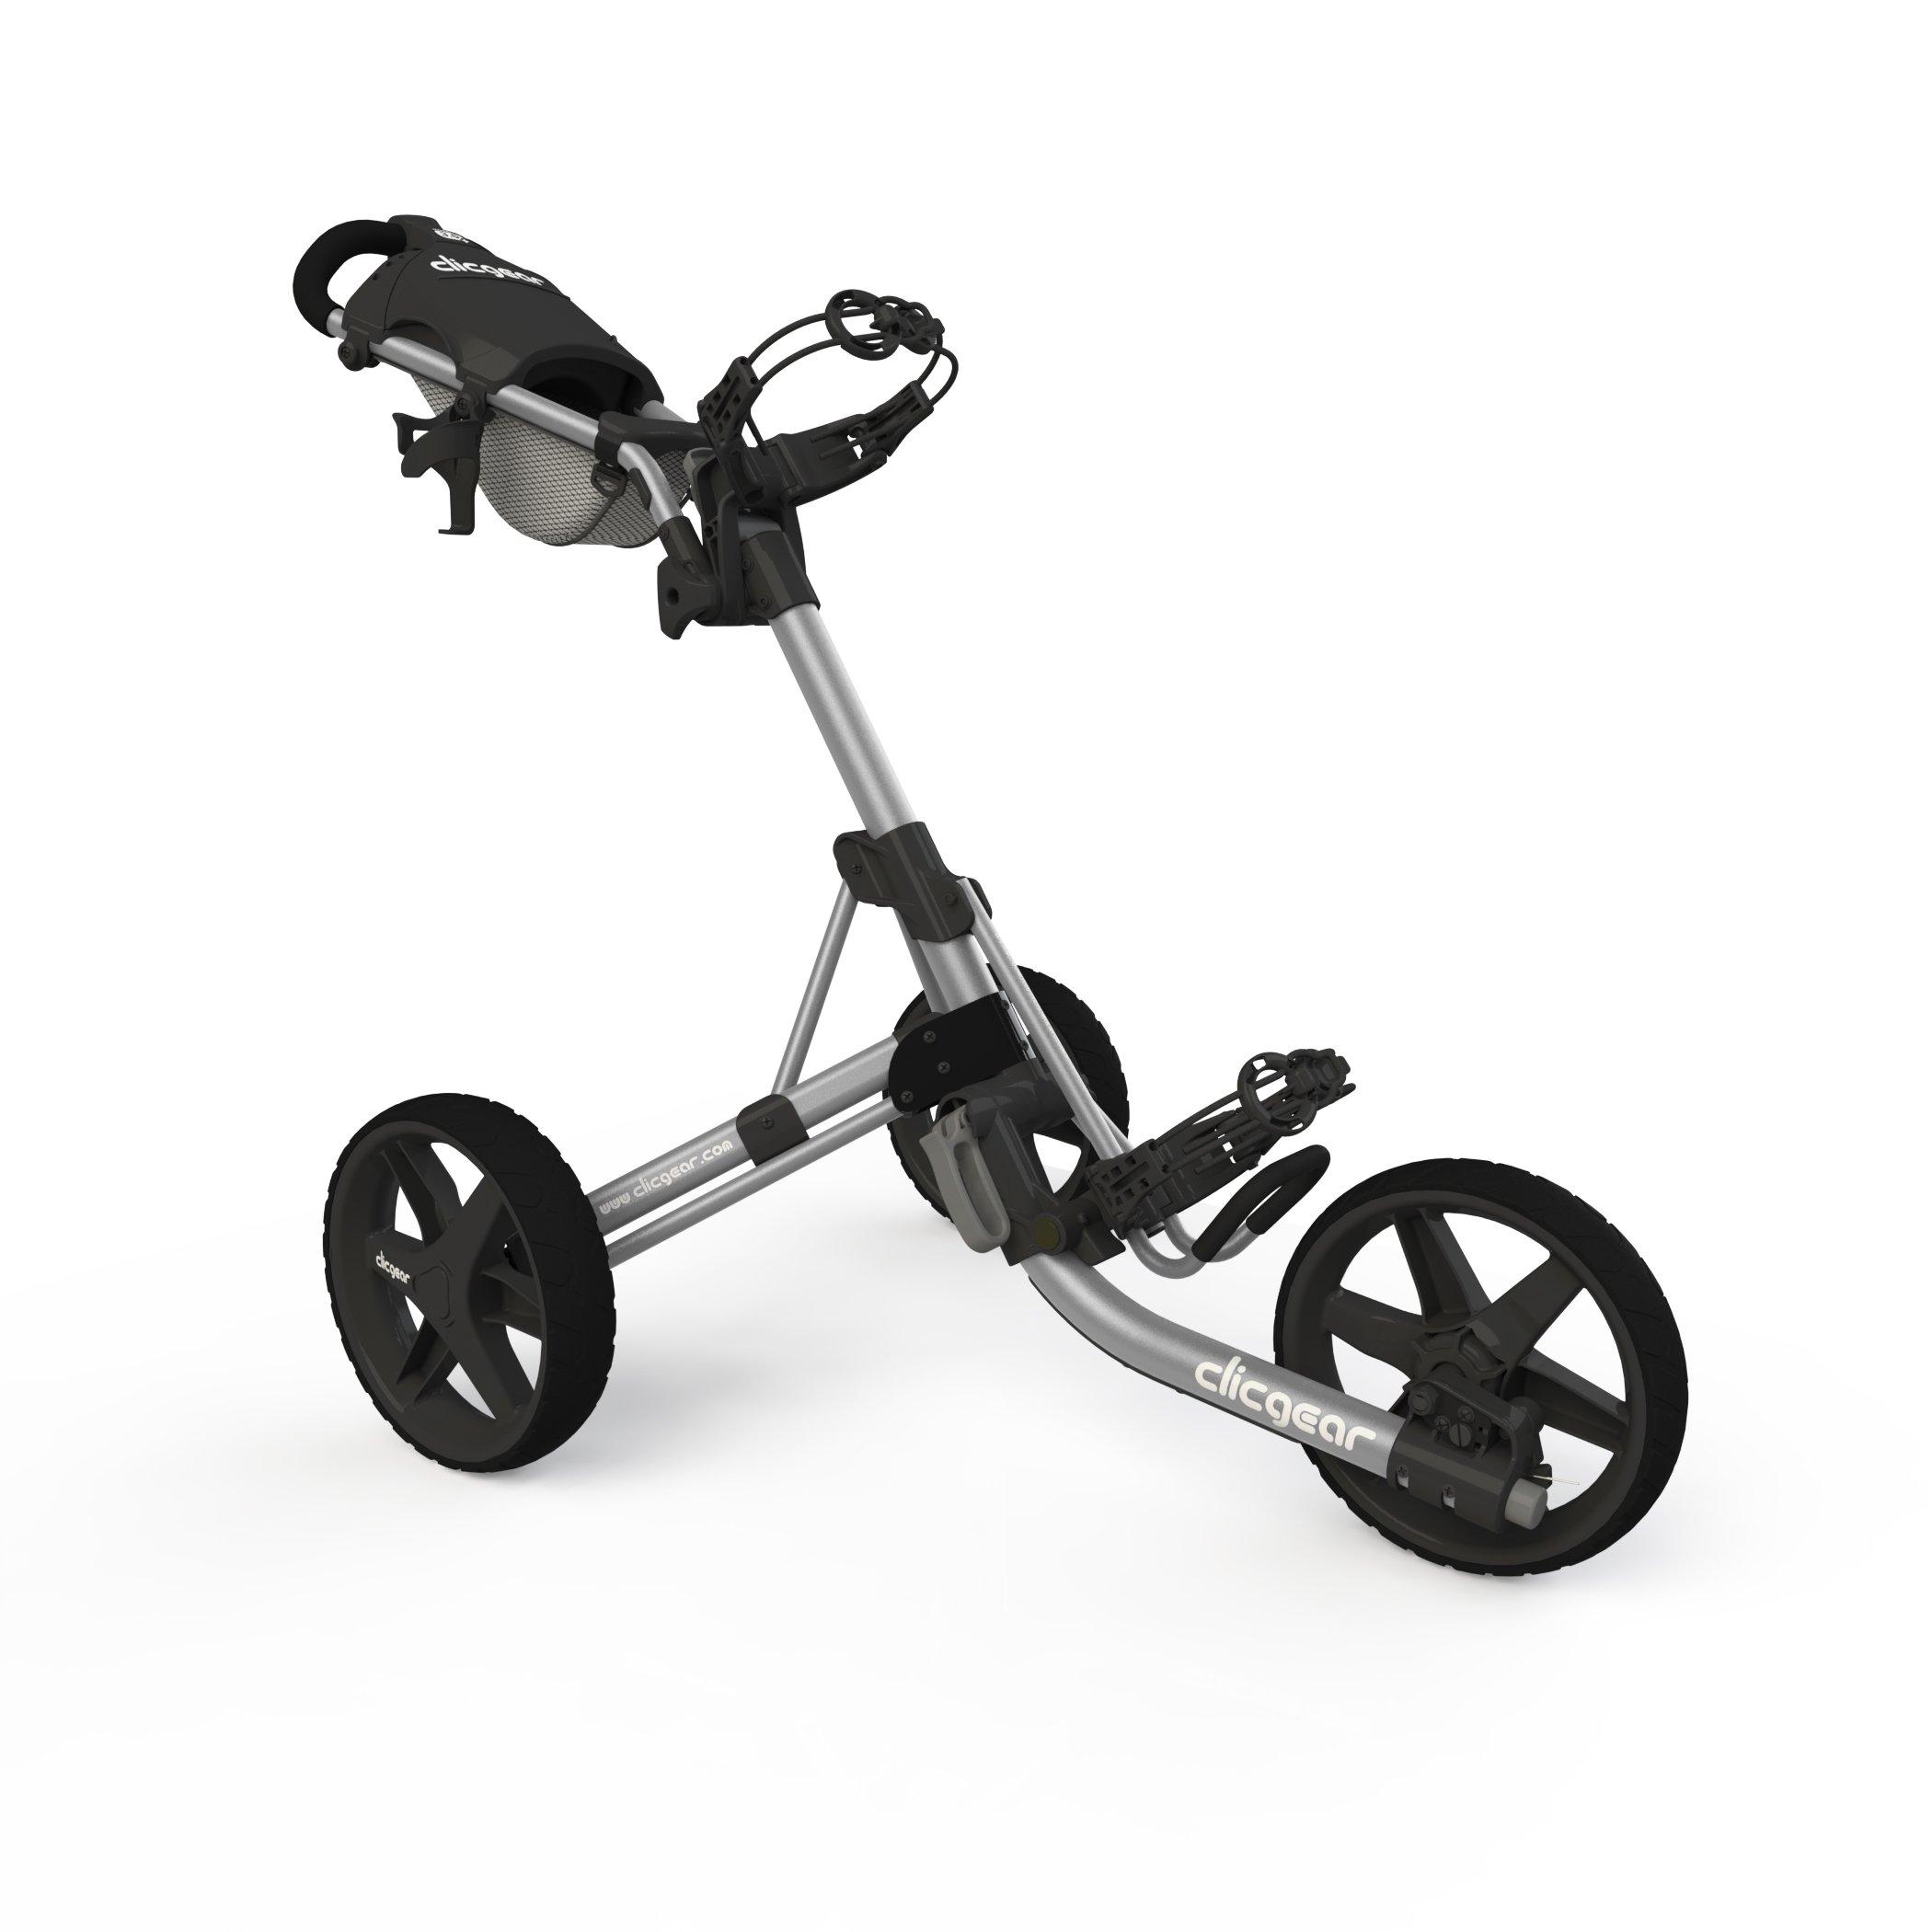 Clicgear Model 3.5+ | 3-Wheel Golf Push Cart  (Silver/Black) by Clicgear